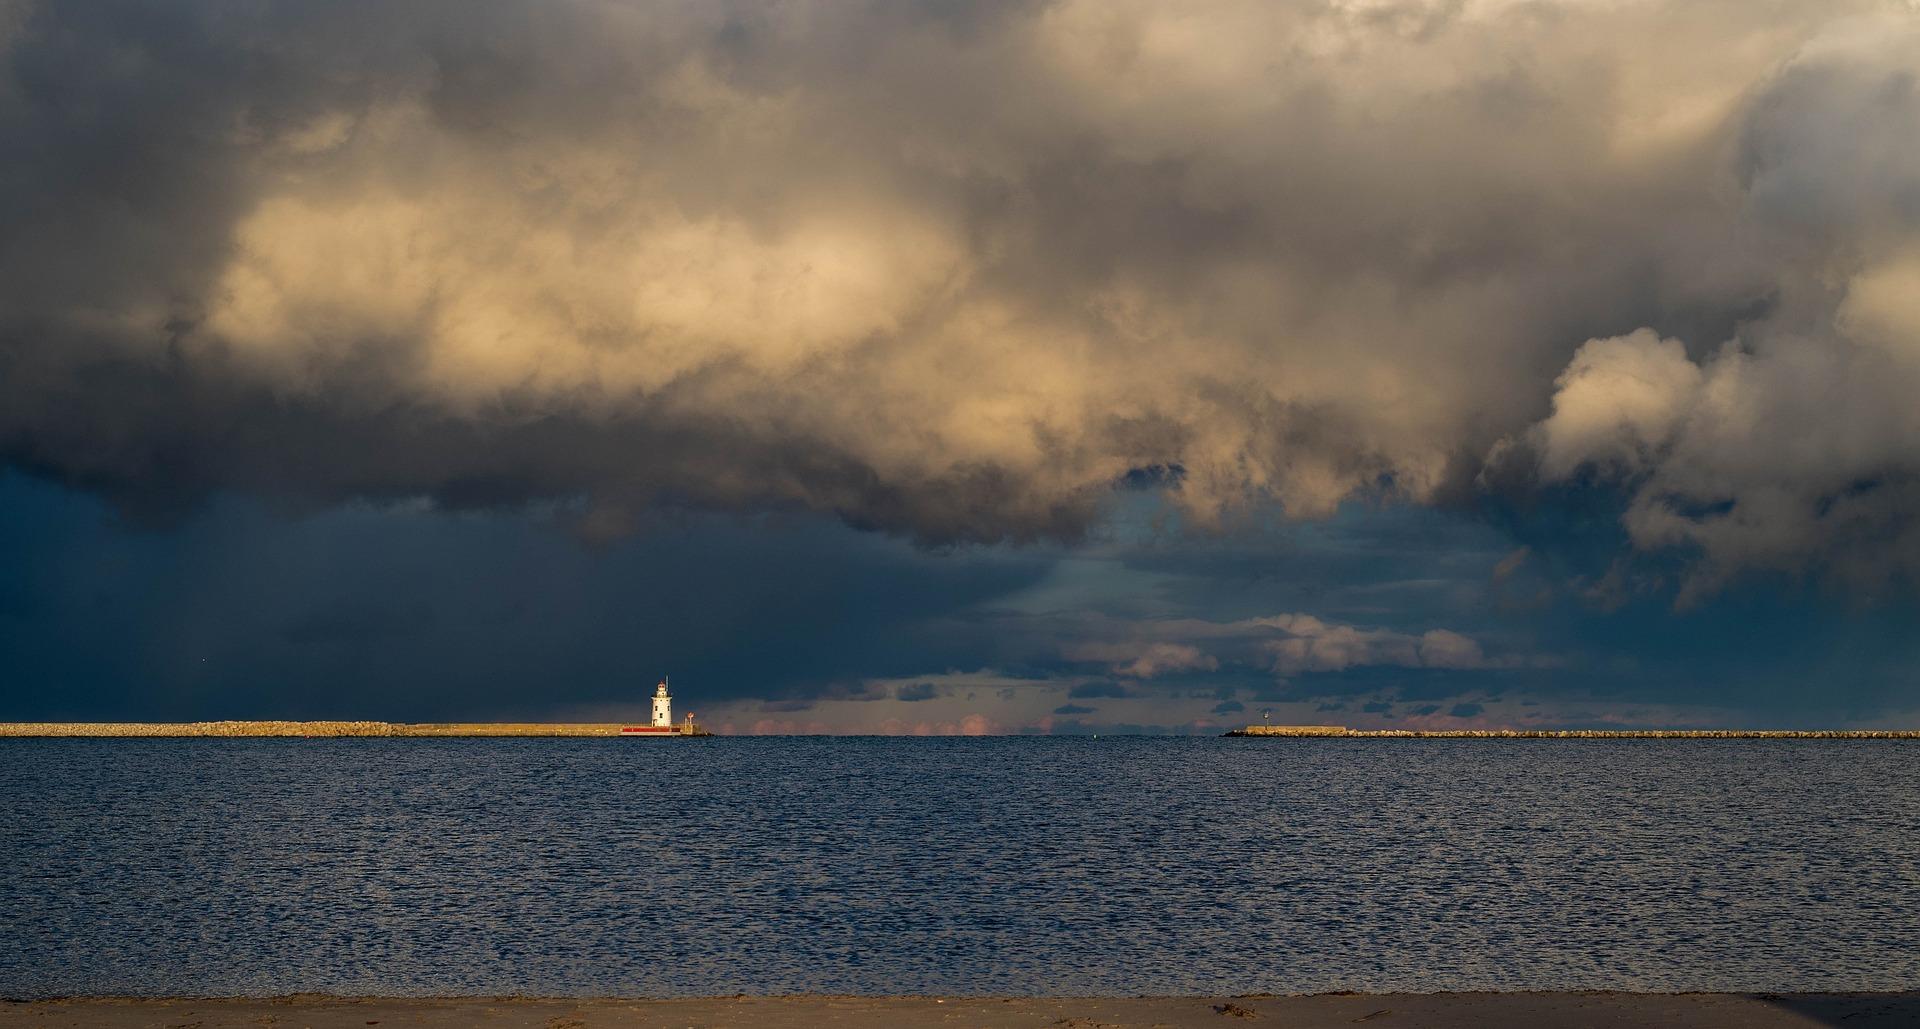 lighthouse-1591030_1920-1